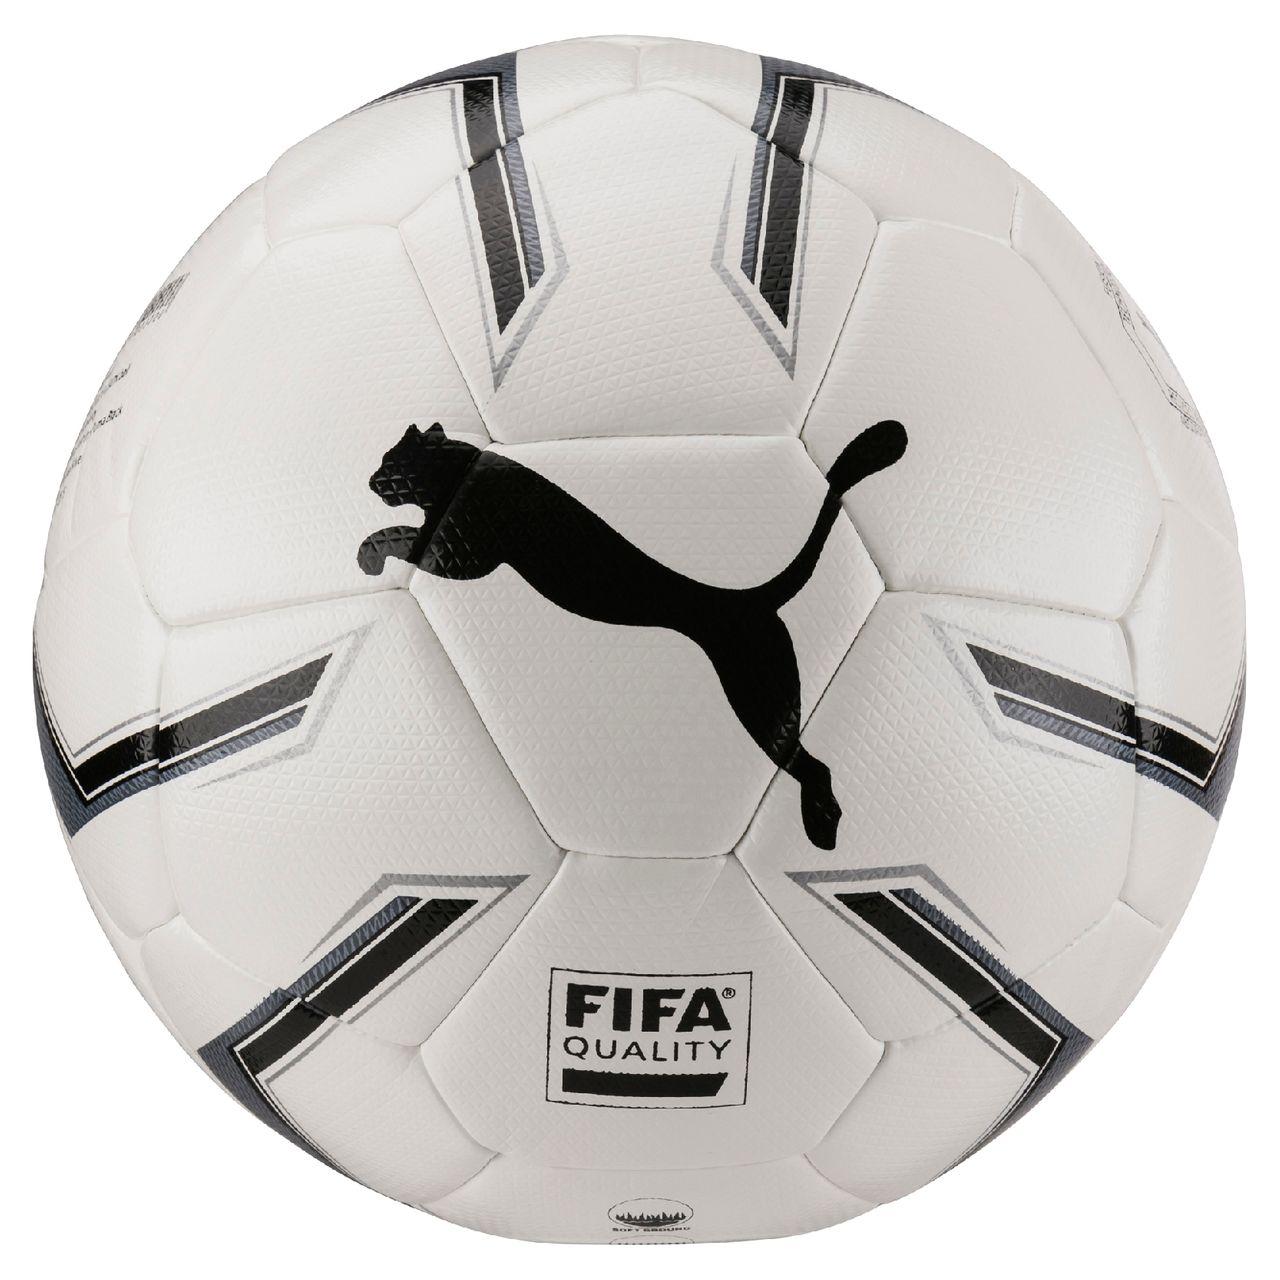 10 x PUMA Spielball - ELITE 2.2 FUSION inkl. Ballsack